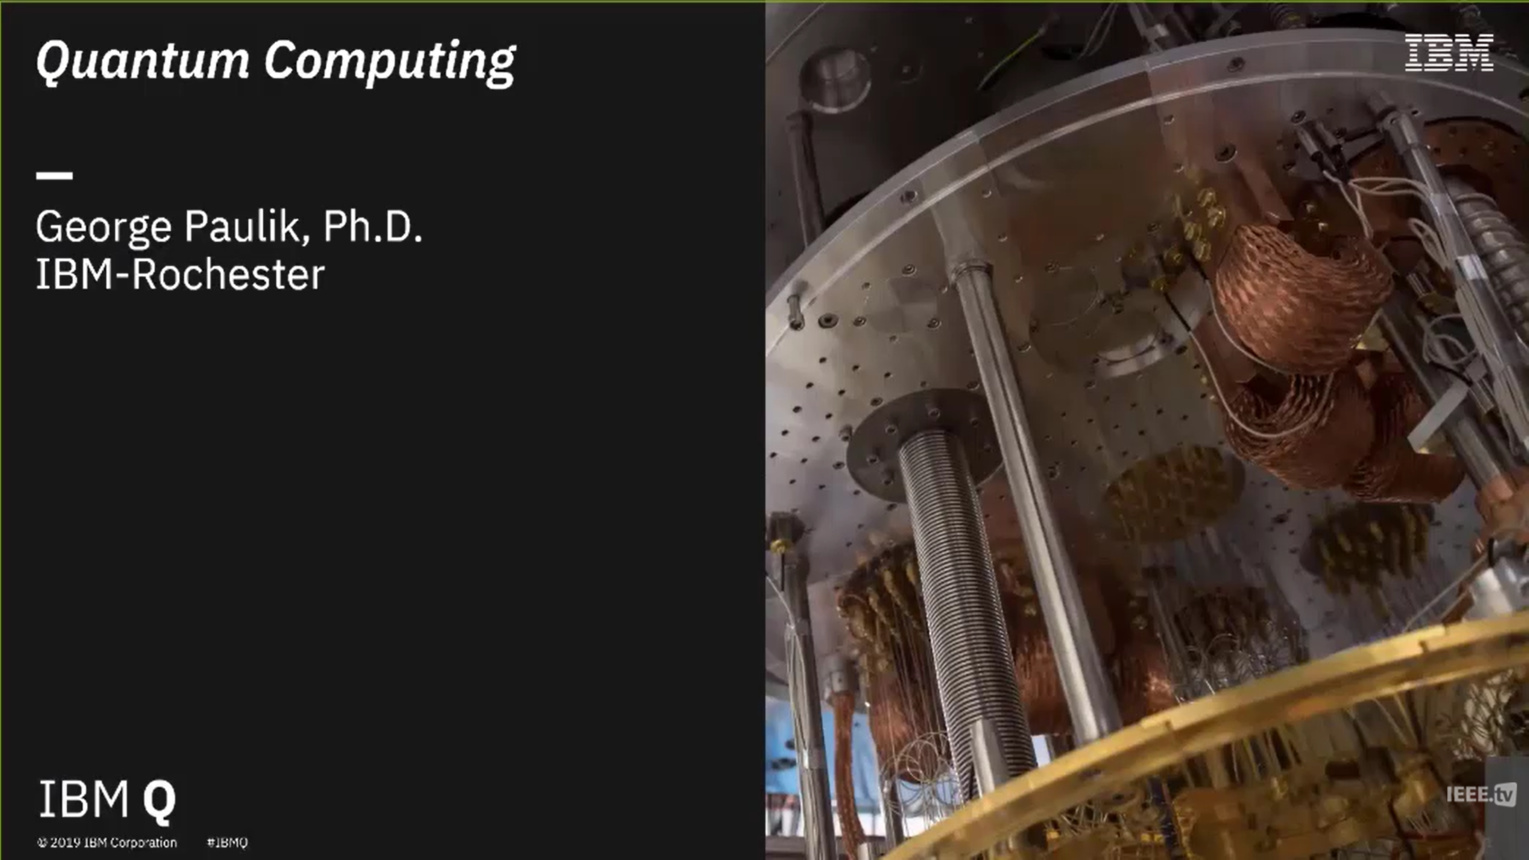 Quantum Computing and IBM Quantum Experience: An Introduction